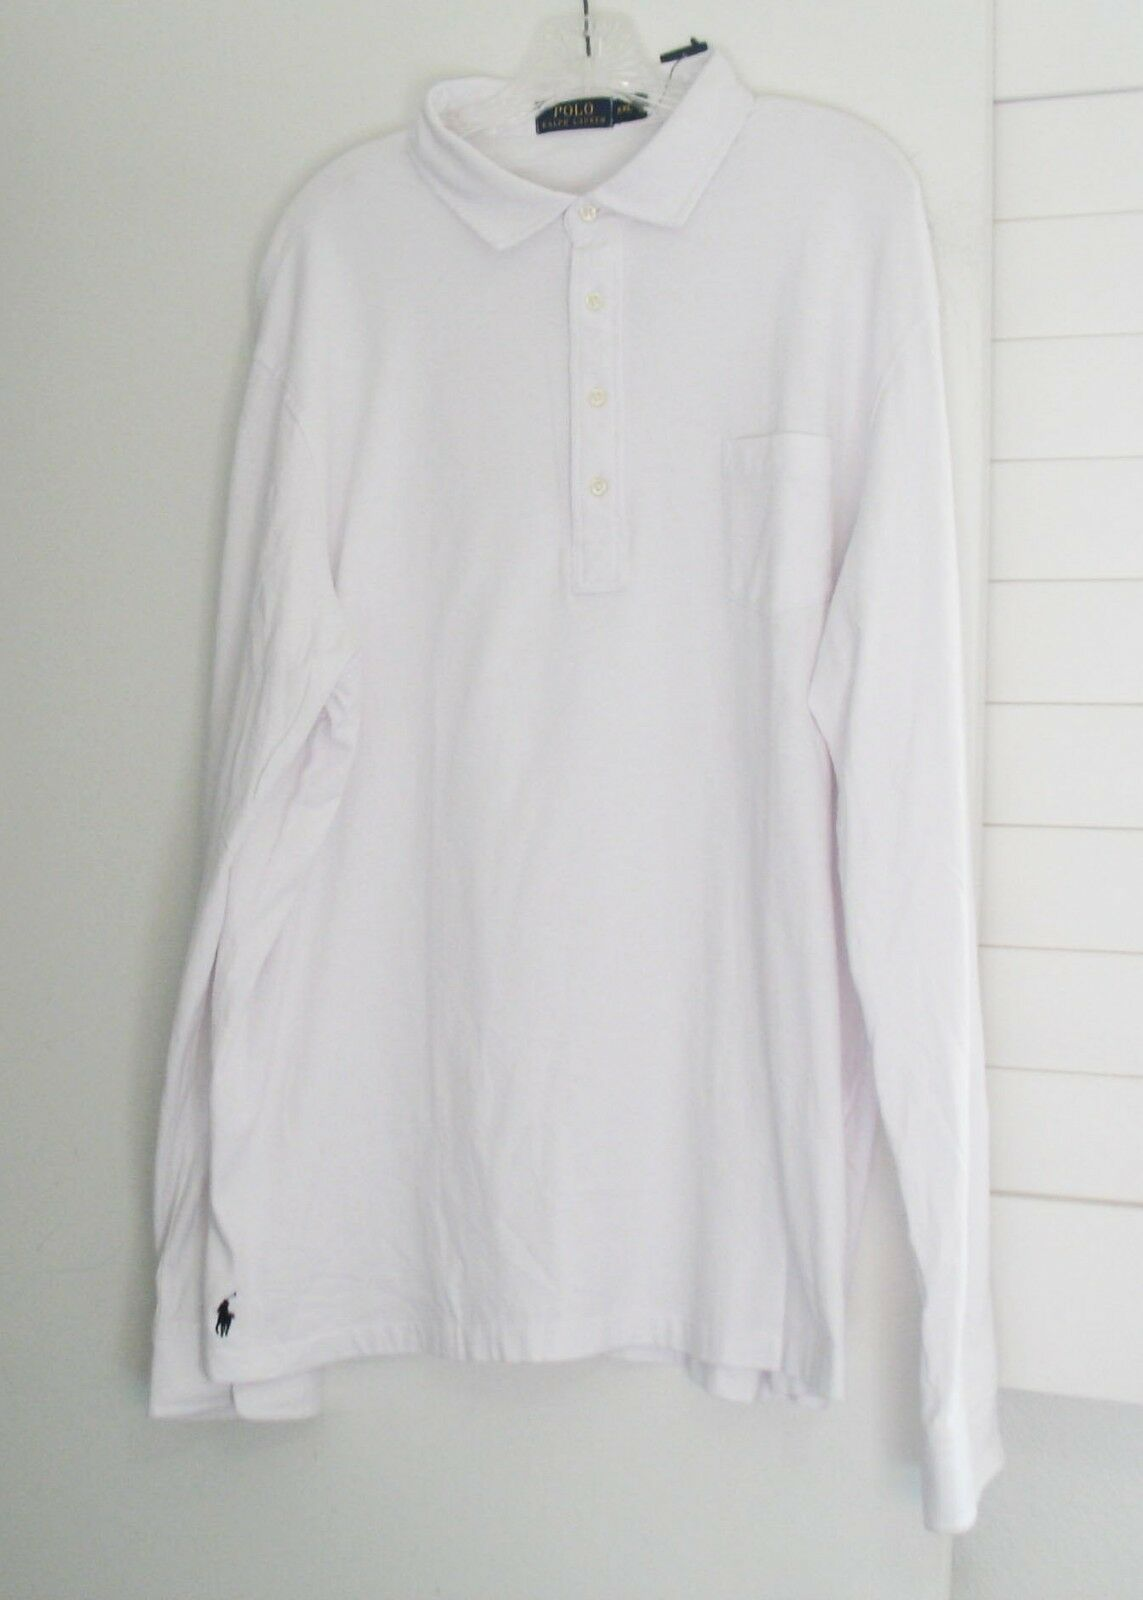 76cb543fad5 Polo Ralph Mens Jersey Long Sleeve Shirt White Sz XL - NWT Lauren ...